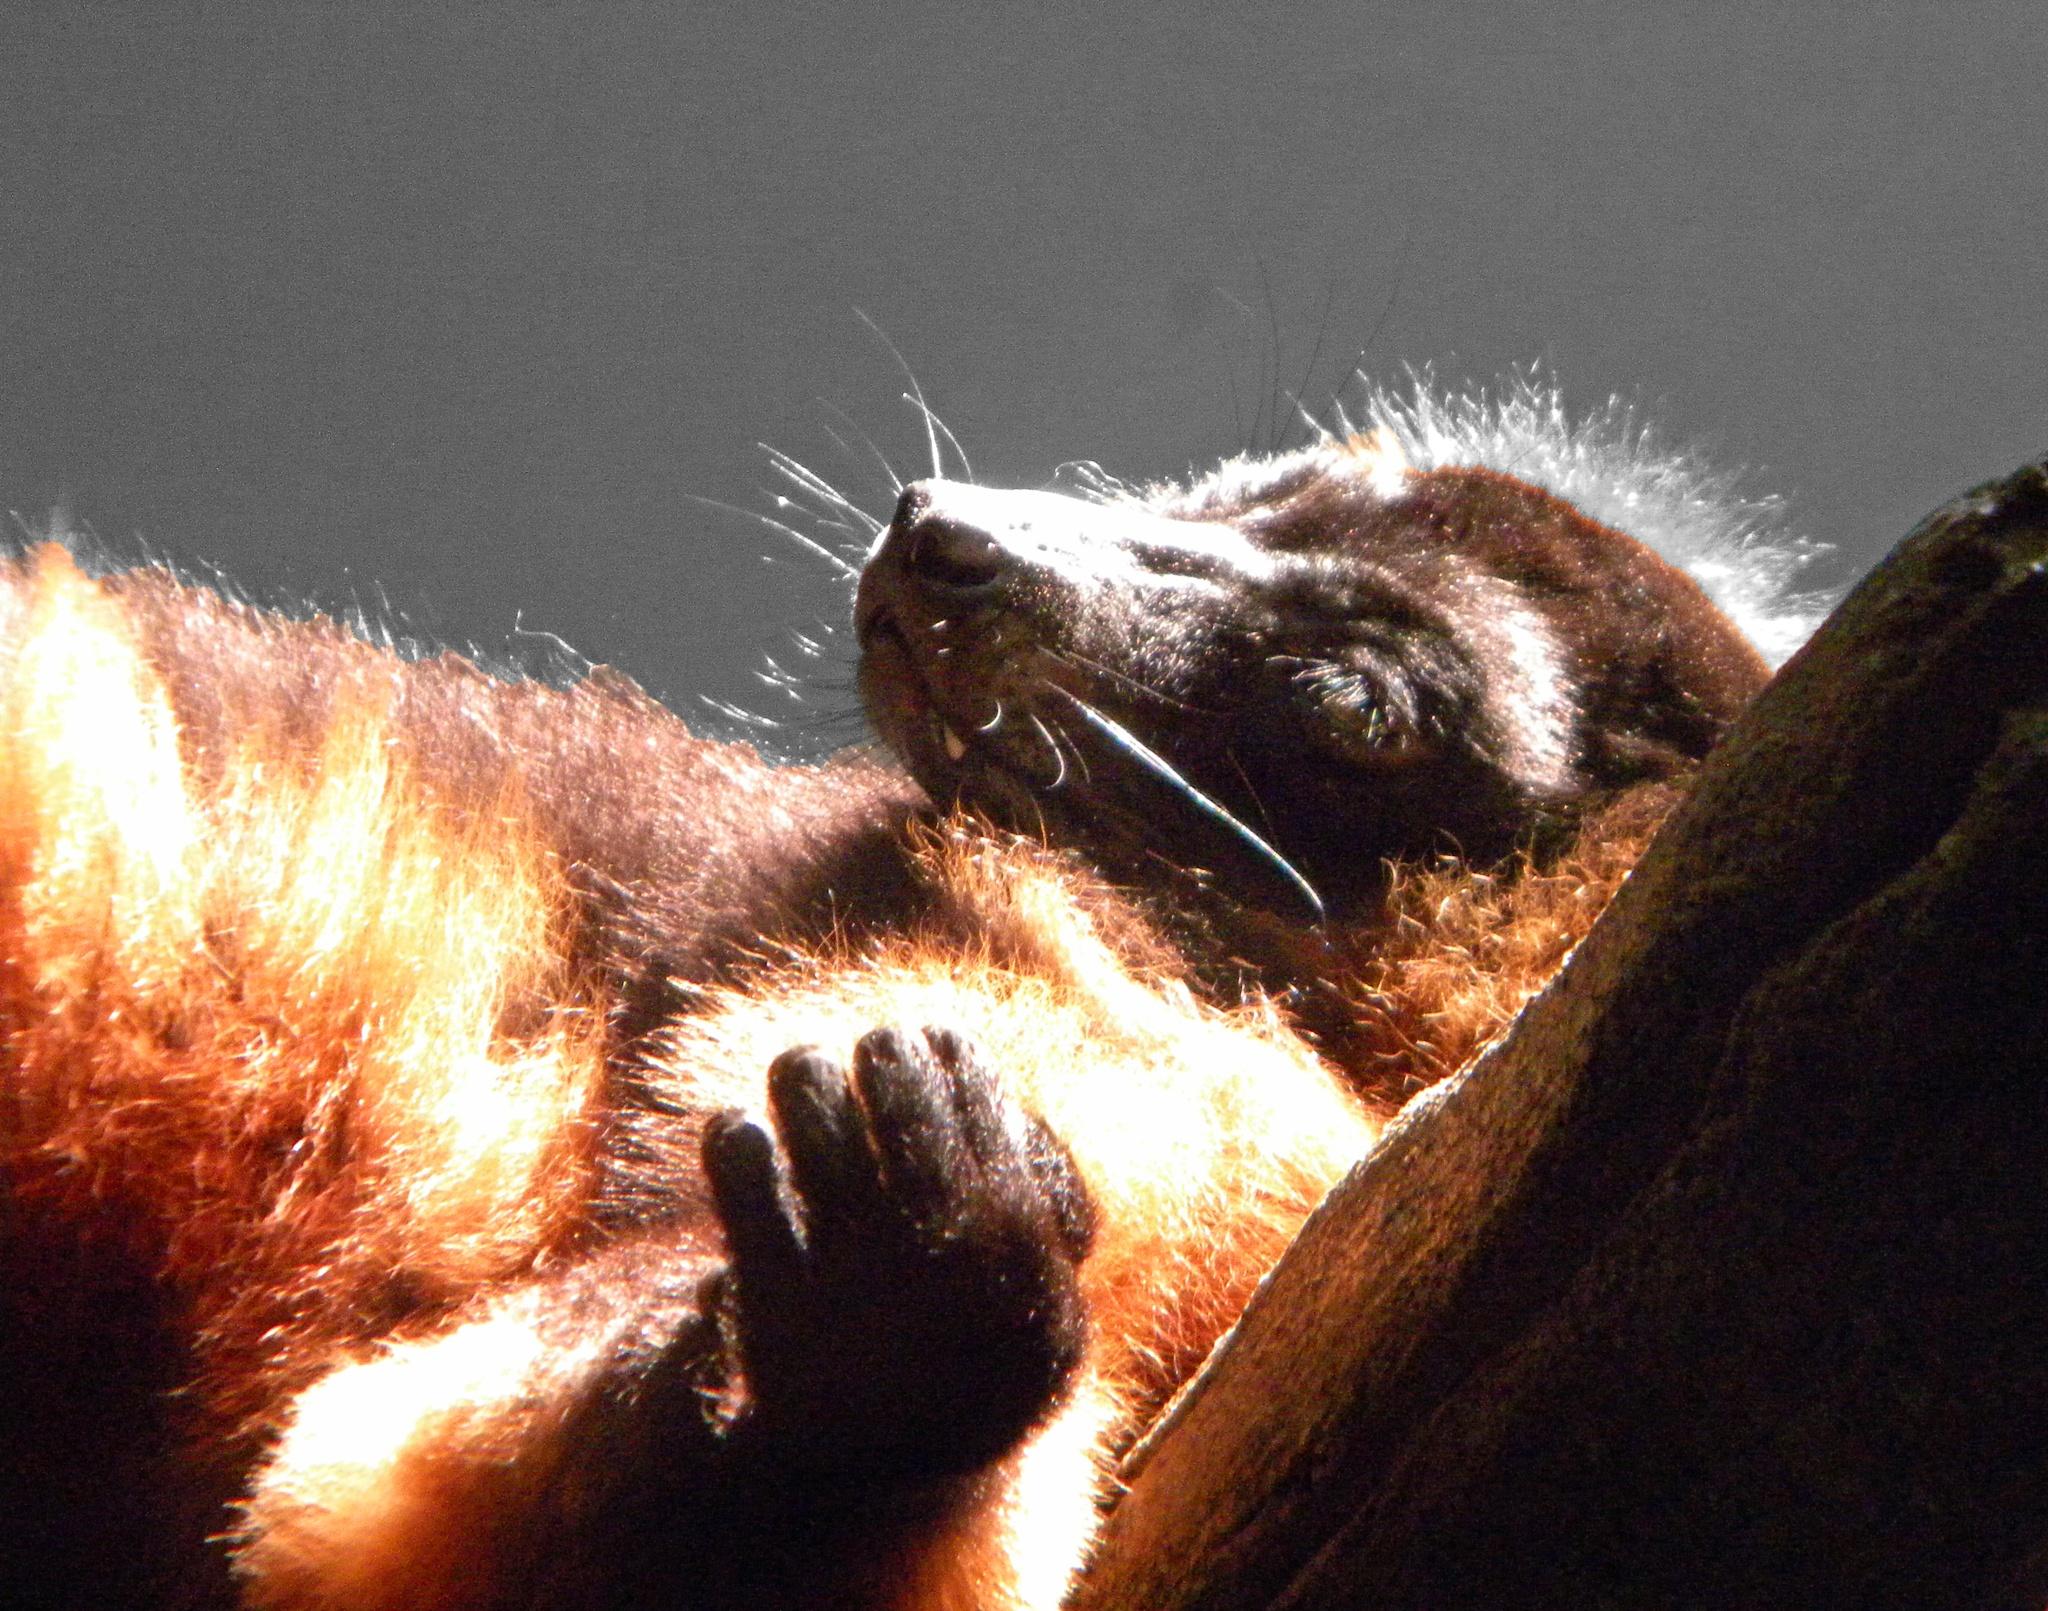 Lemur Lounging by Phillip W. Strunk